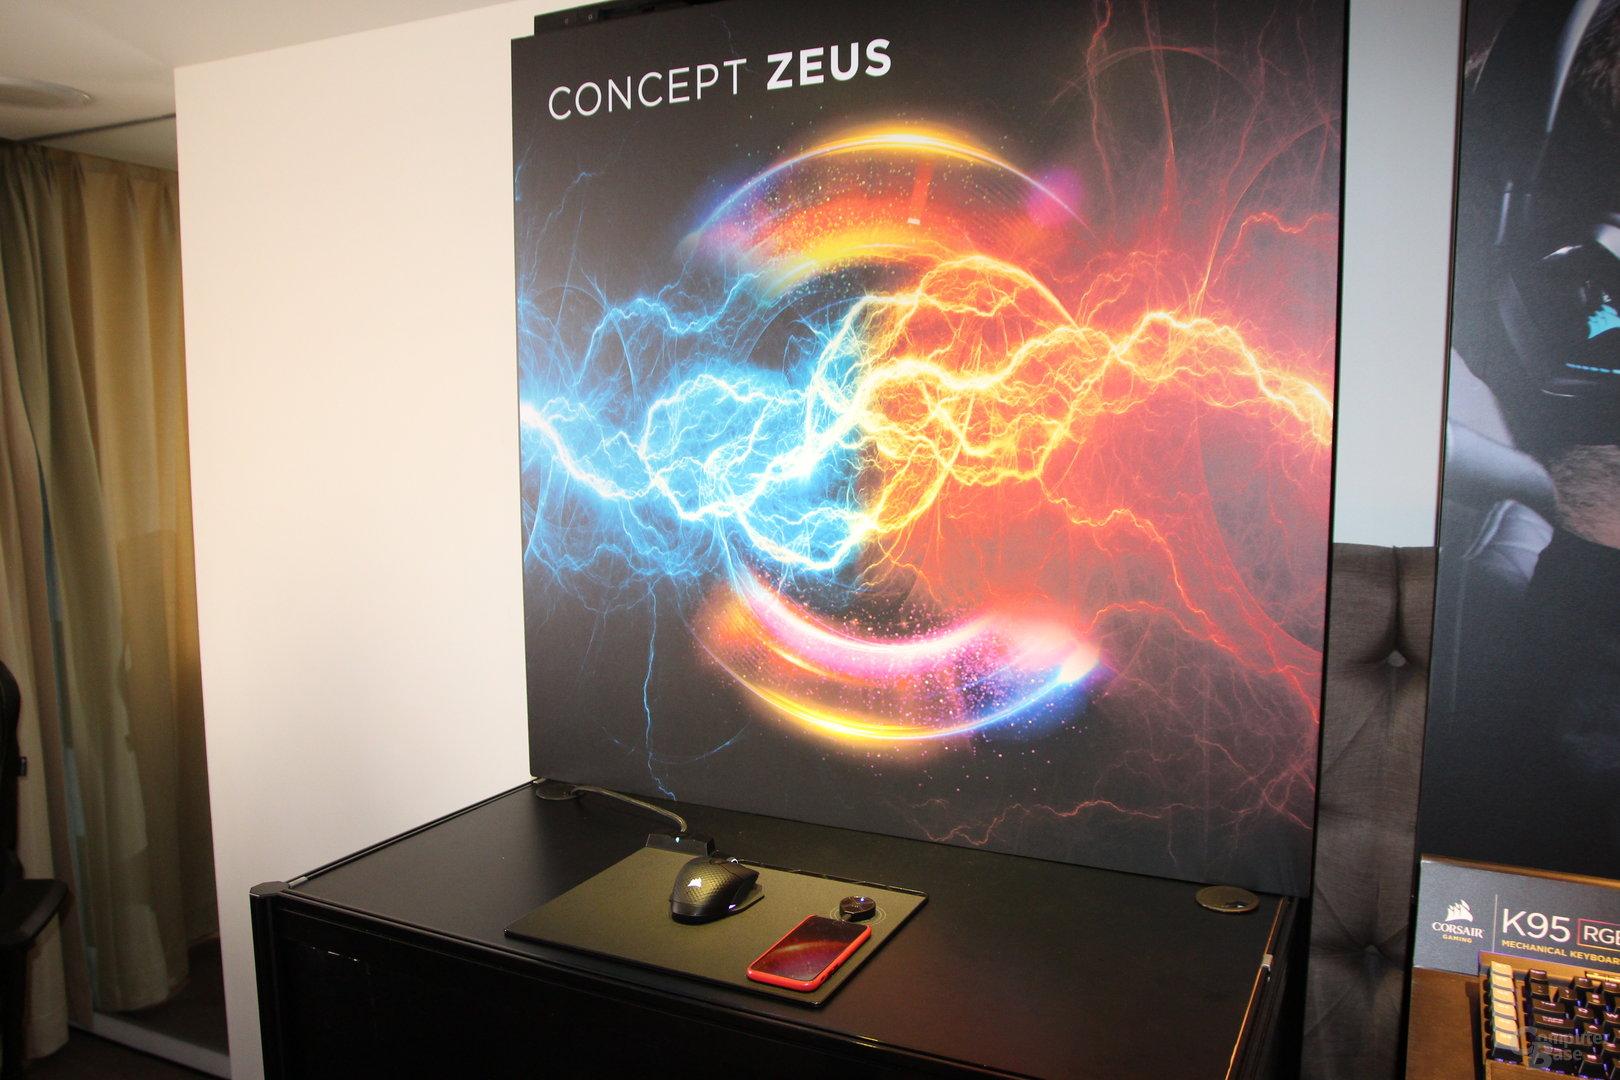 Corsair Concept Zeus